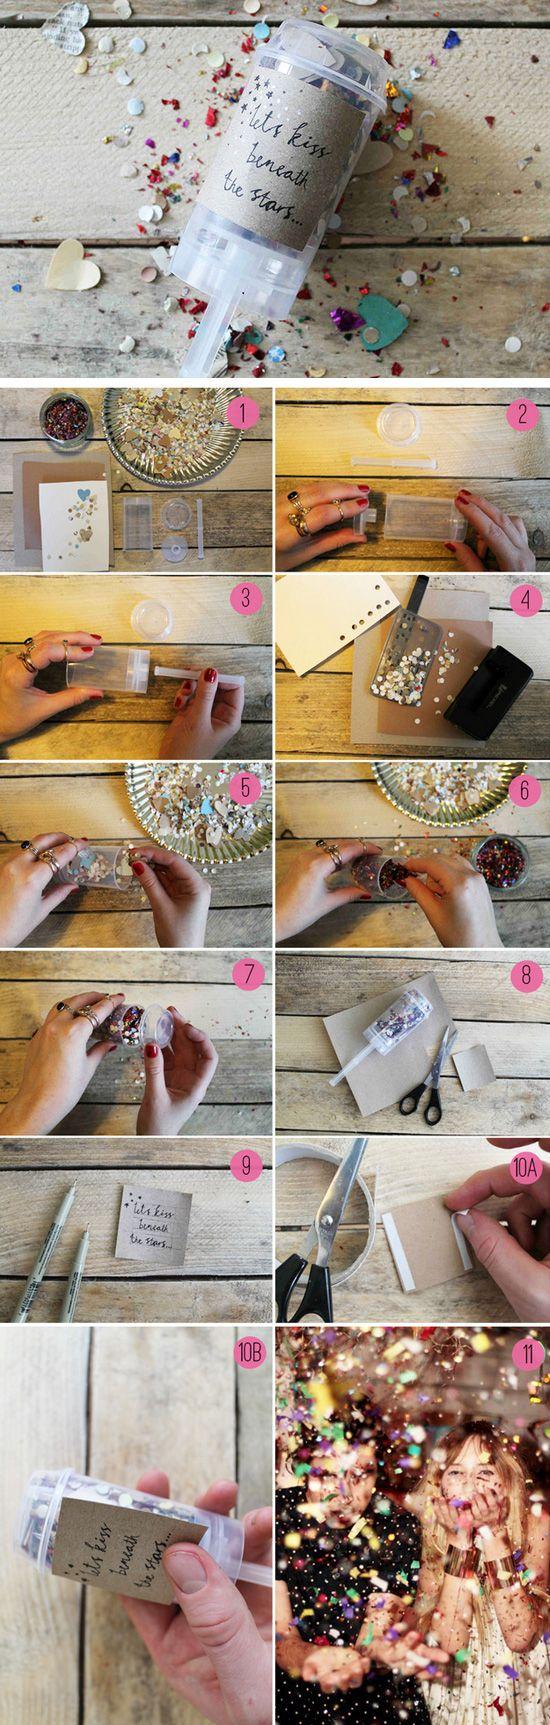 DIY Confetti Pops   Click Pic for 24 DIY Spring Wedding Ideas on a Budget   DIY Spring Wedding Decorations on a Budget